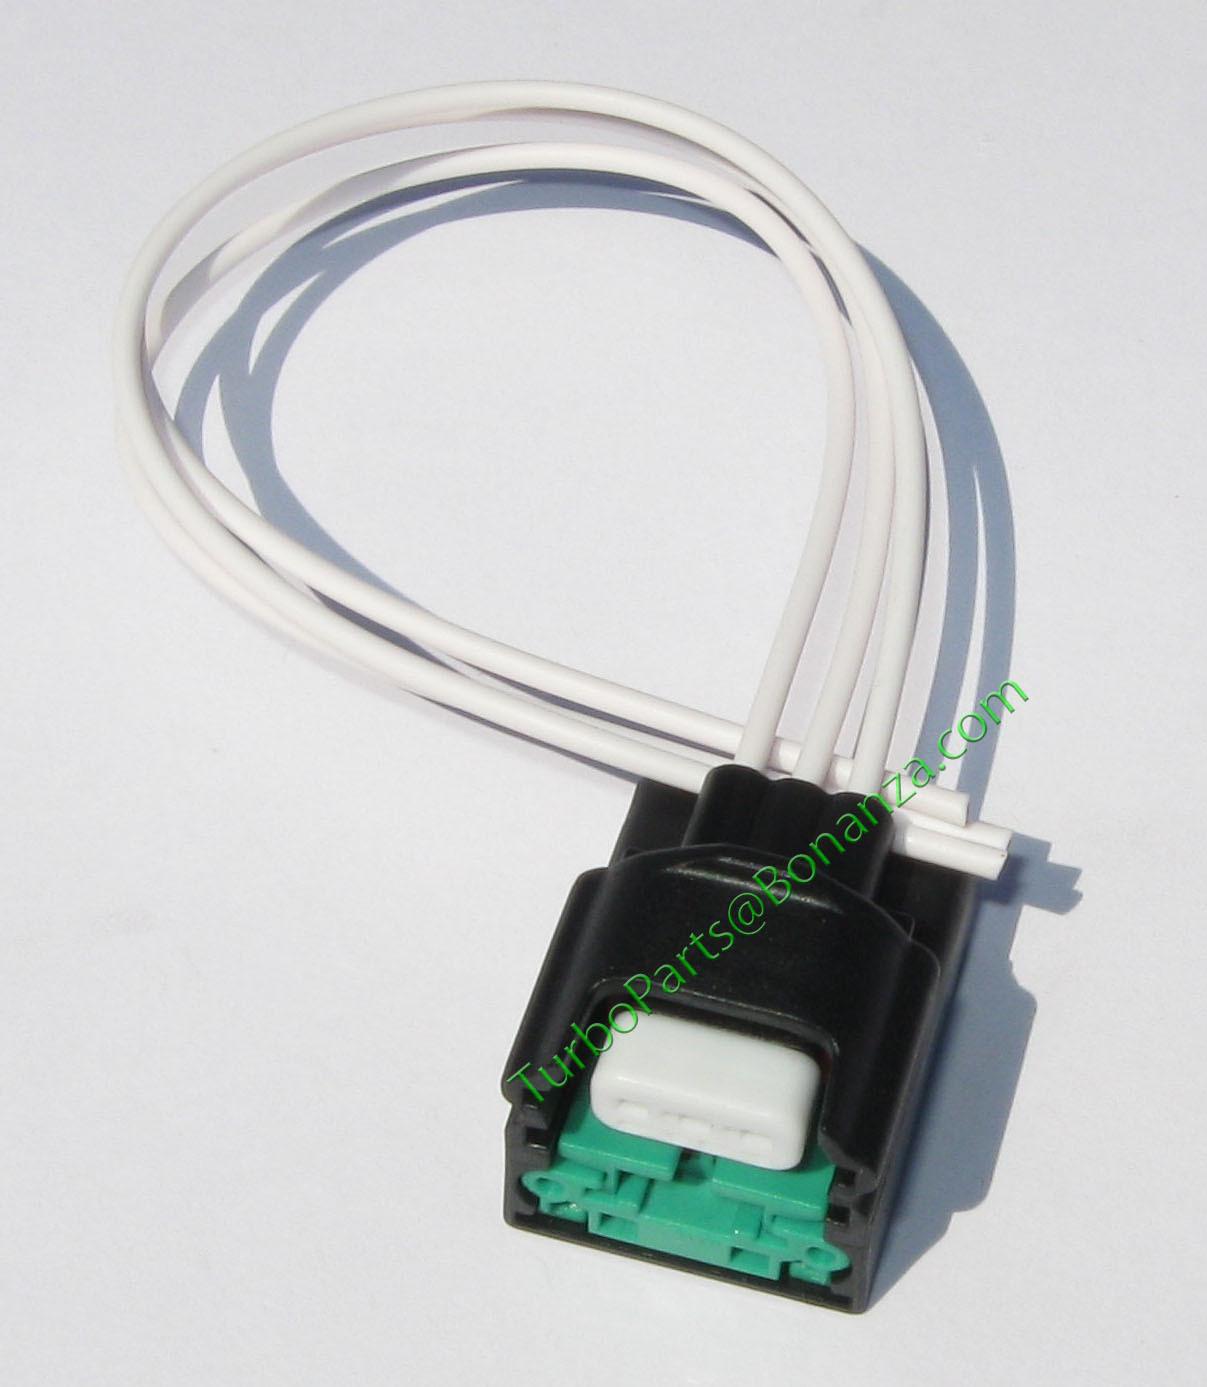 Qr25de Crankshaft Position Sensor: Crankshaft Position Sensor Connector Plug For Nissan